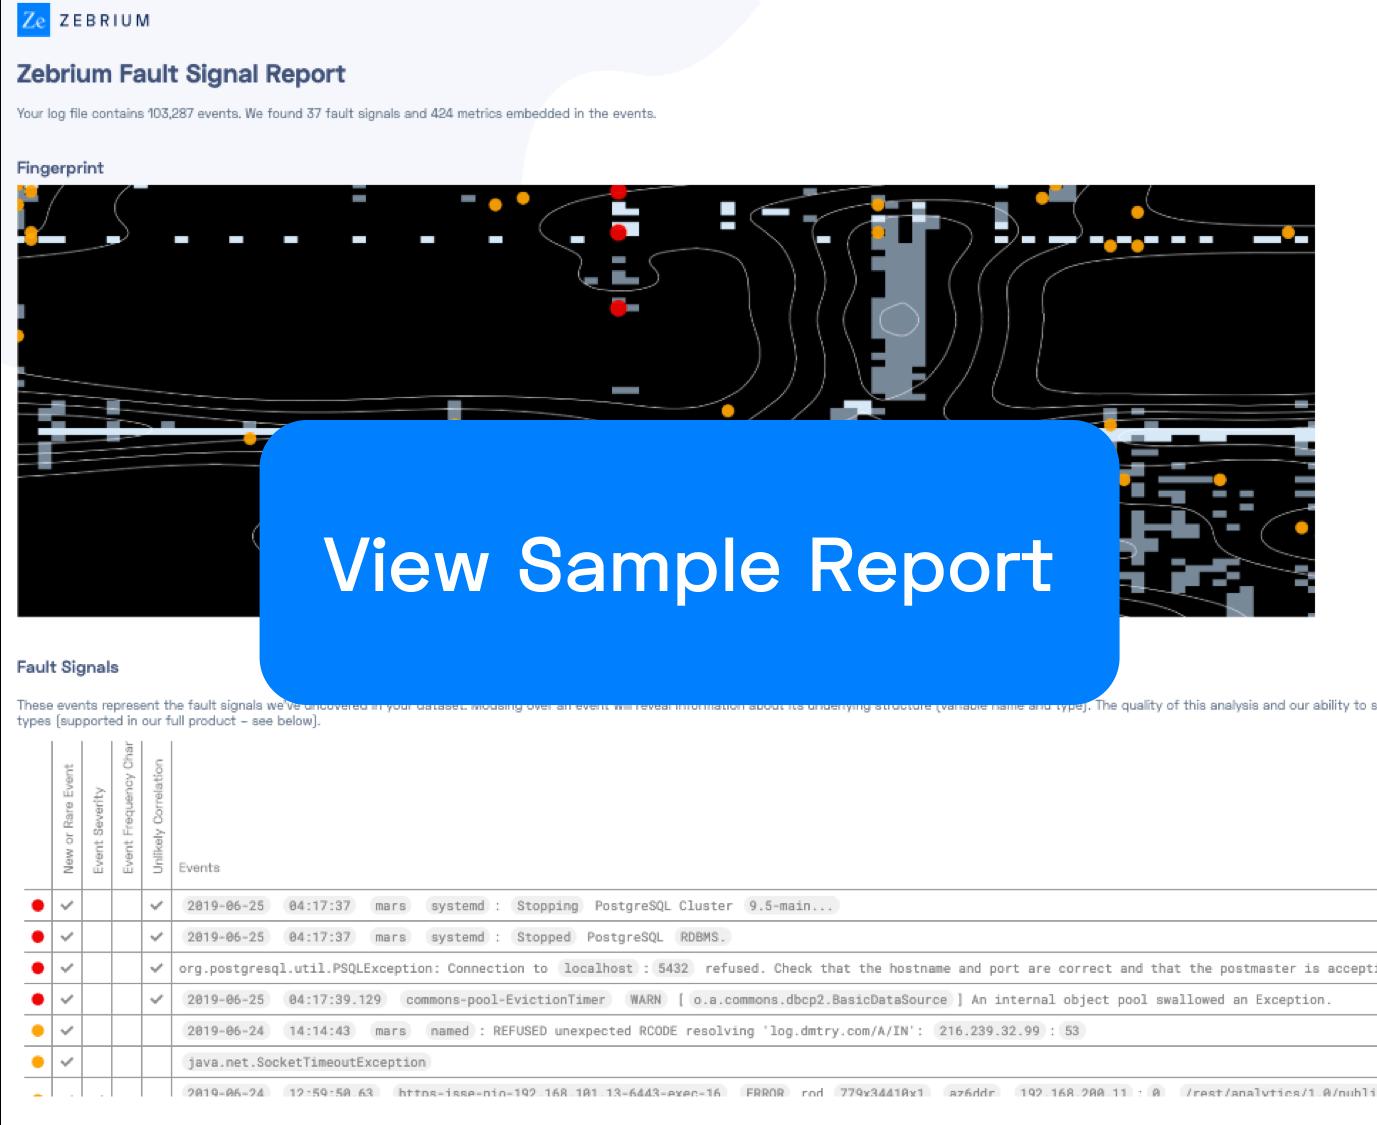 Sample report v6